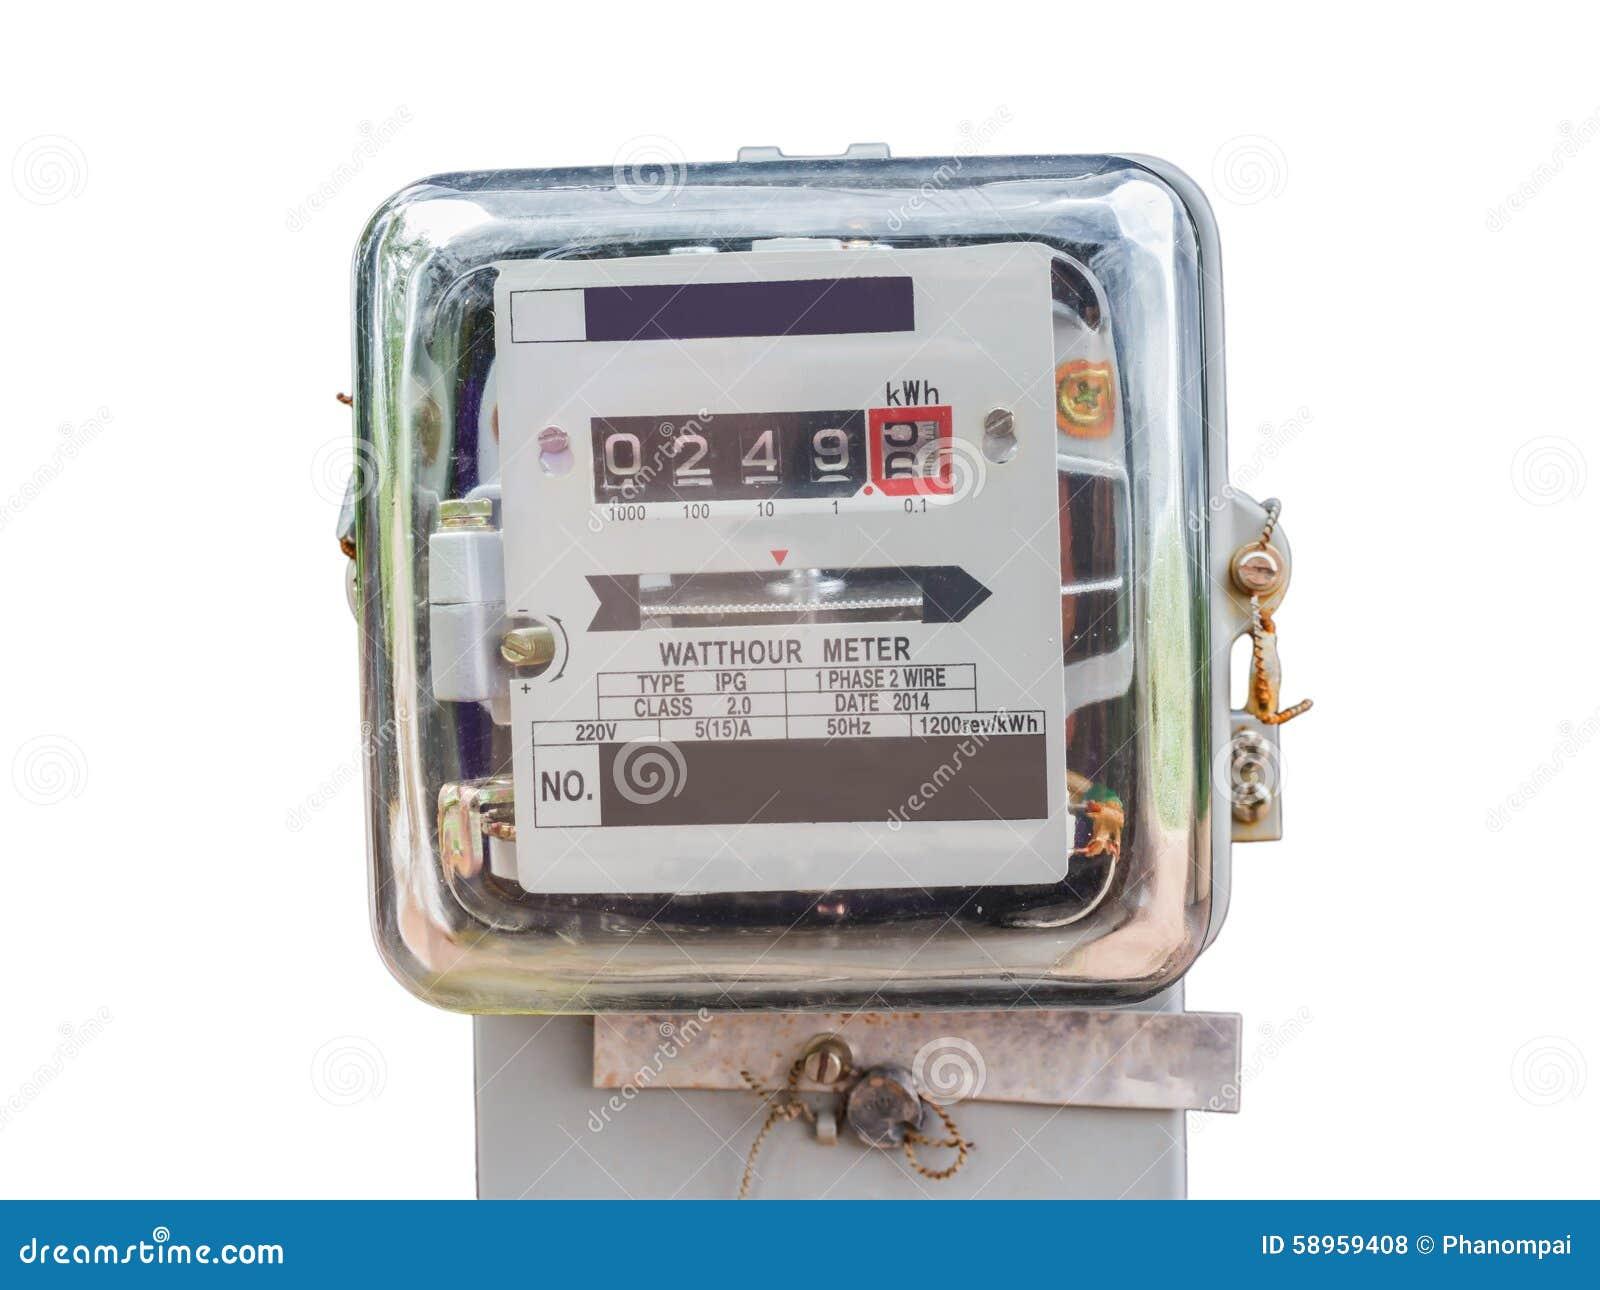 Multifunction Meter Front View : Watt hour electric meter measurement tool home use front